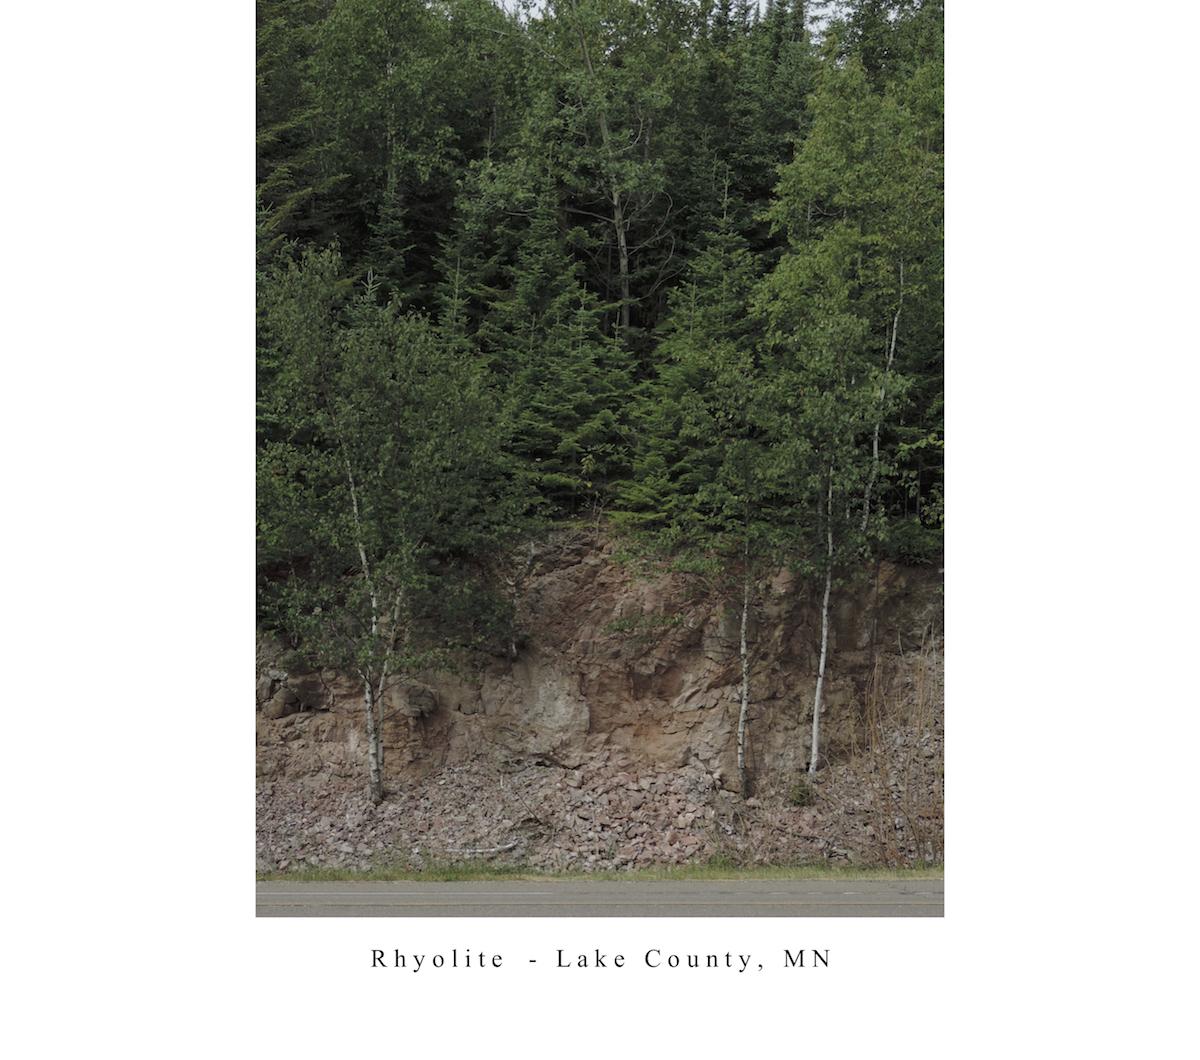 rhyolite copy.jpg